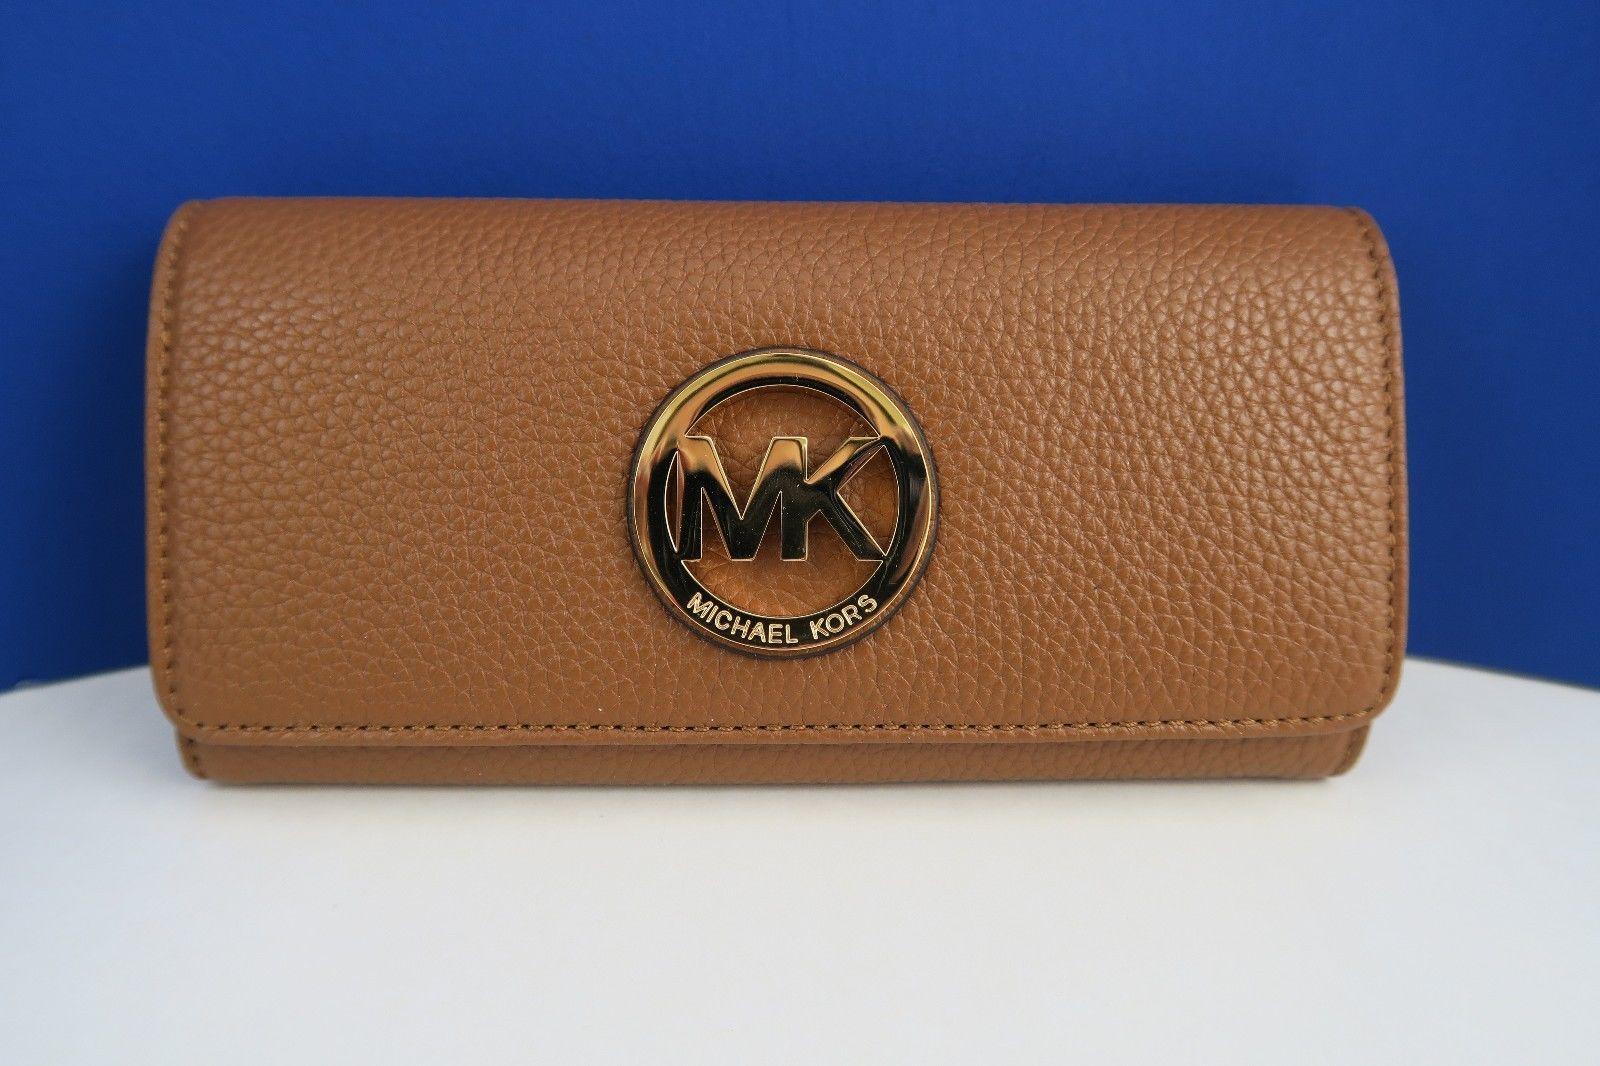 037056e8aff88e ... where to buy michael kors fulton flap continental wallet acorn nwt  4343a c3ca5